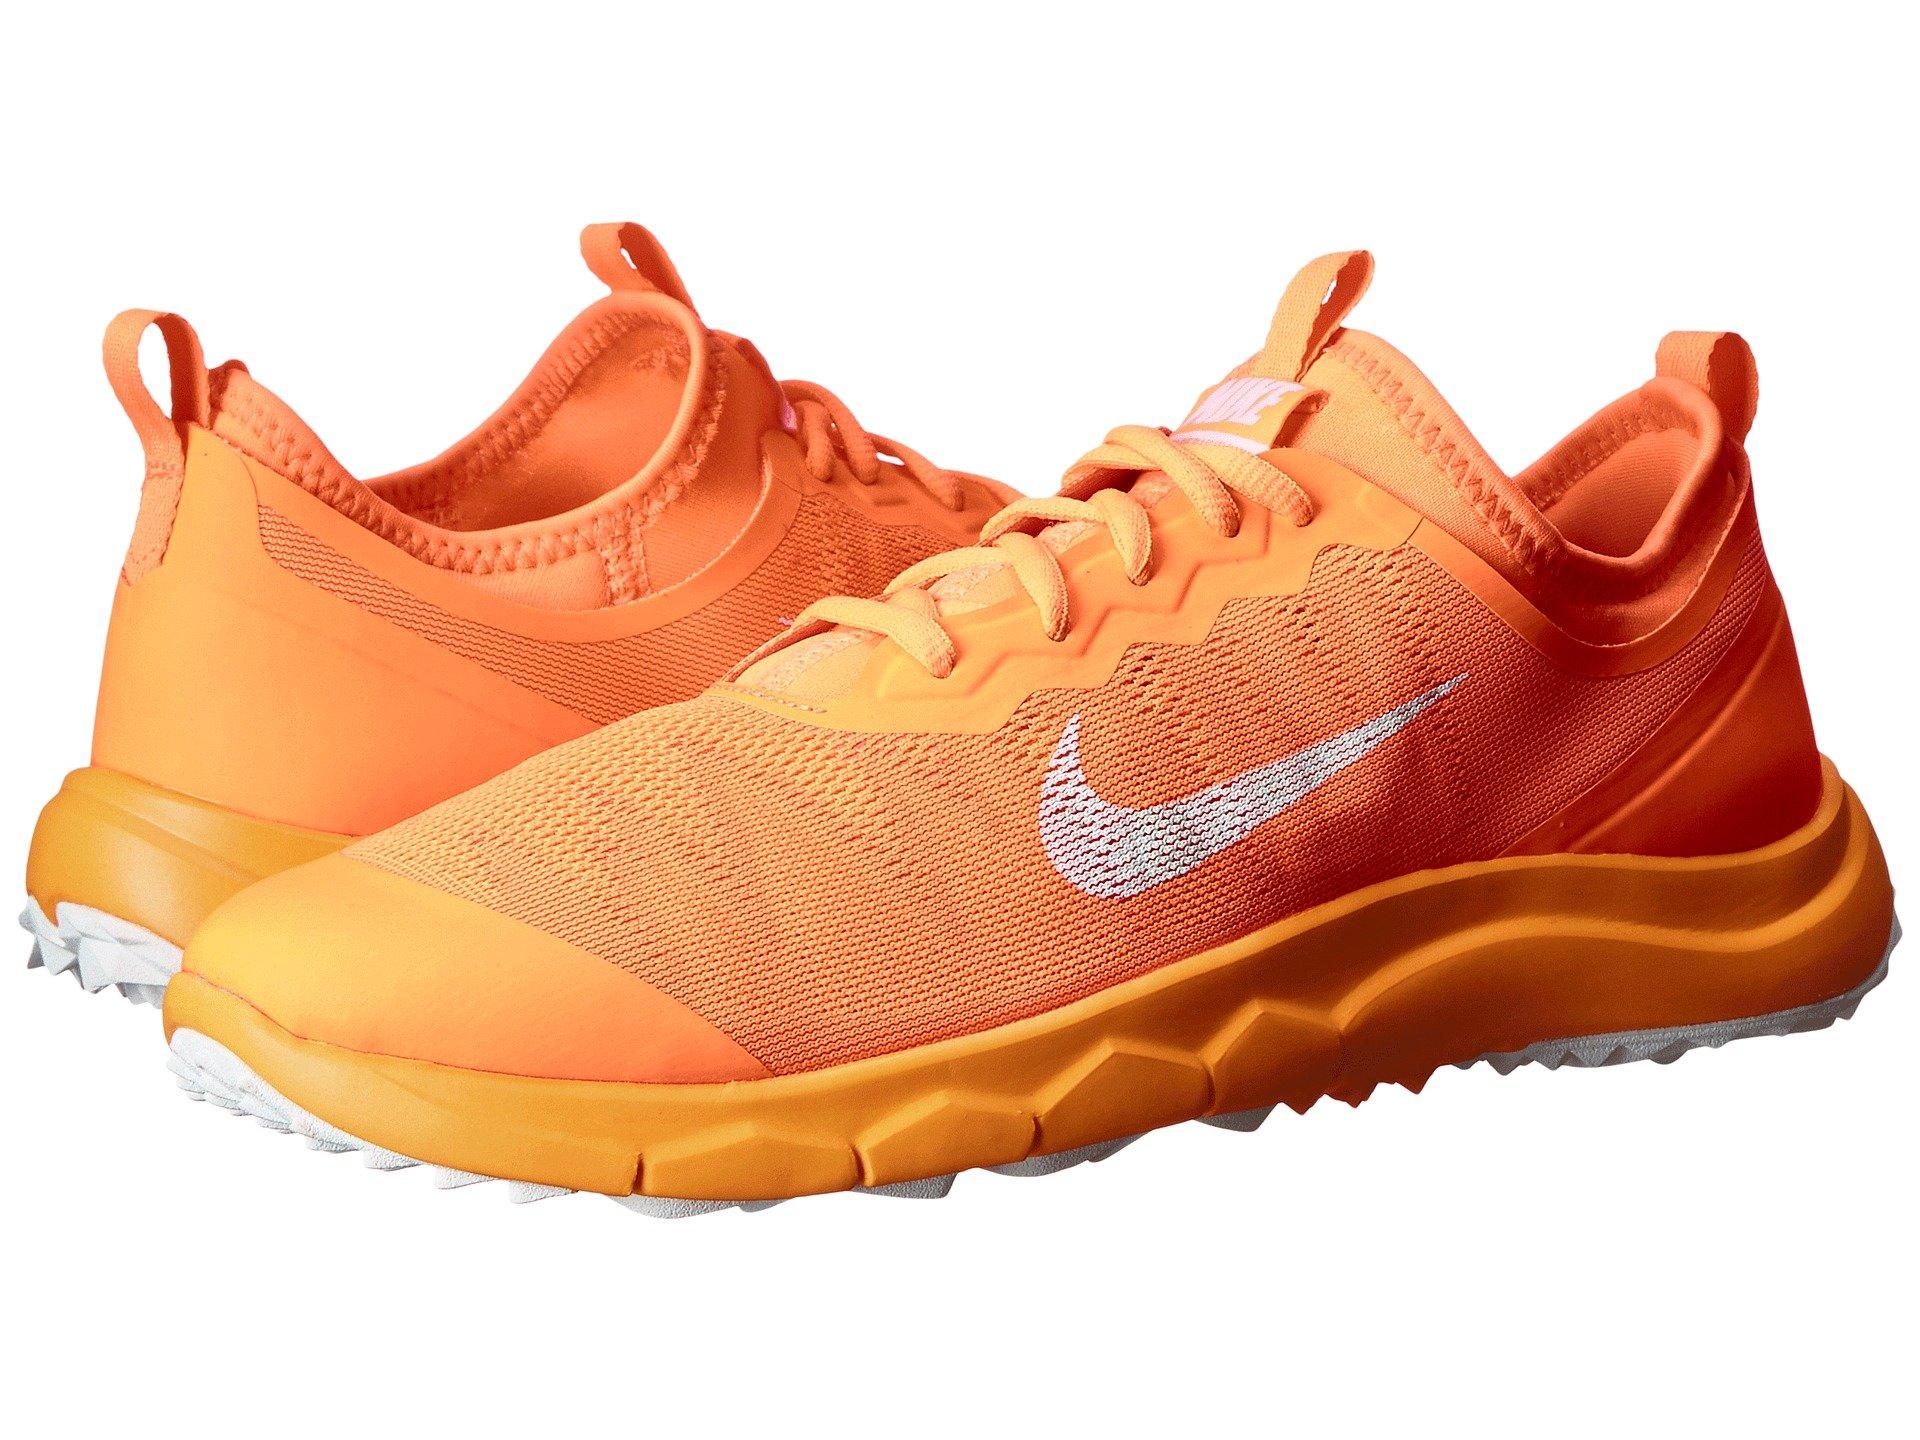 Nike F Bermuda Golf Shoes